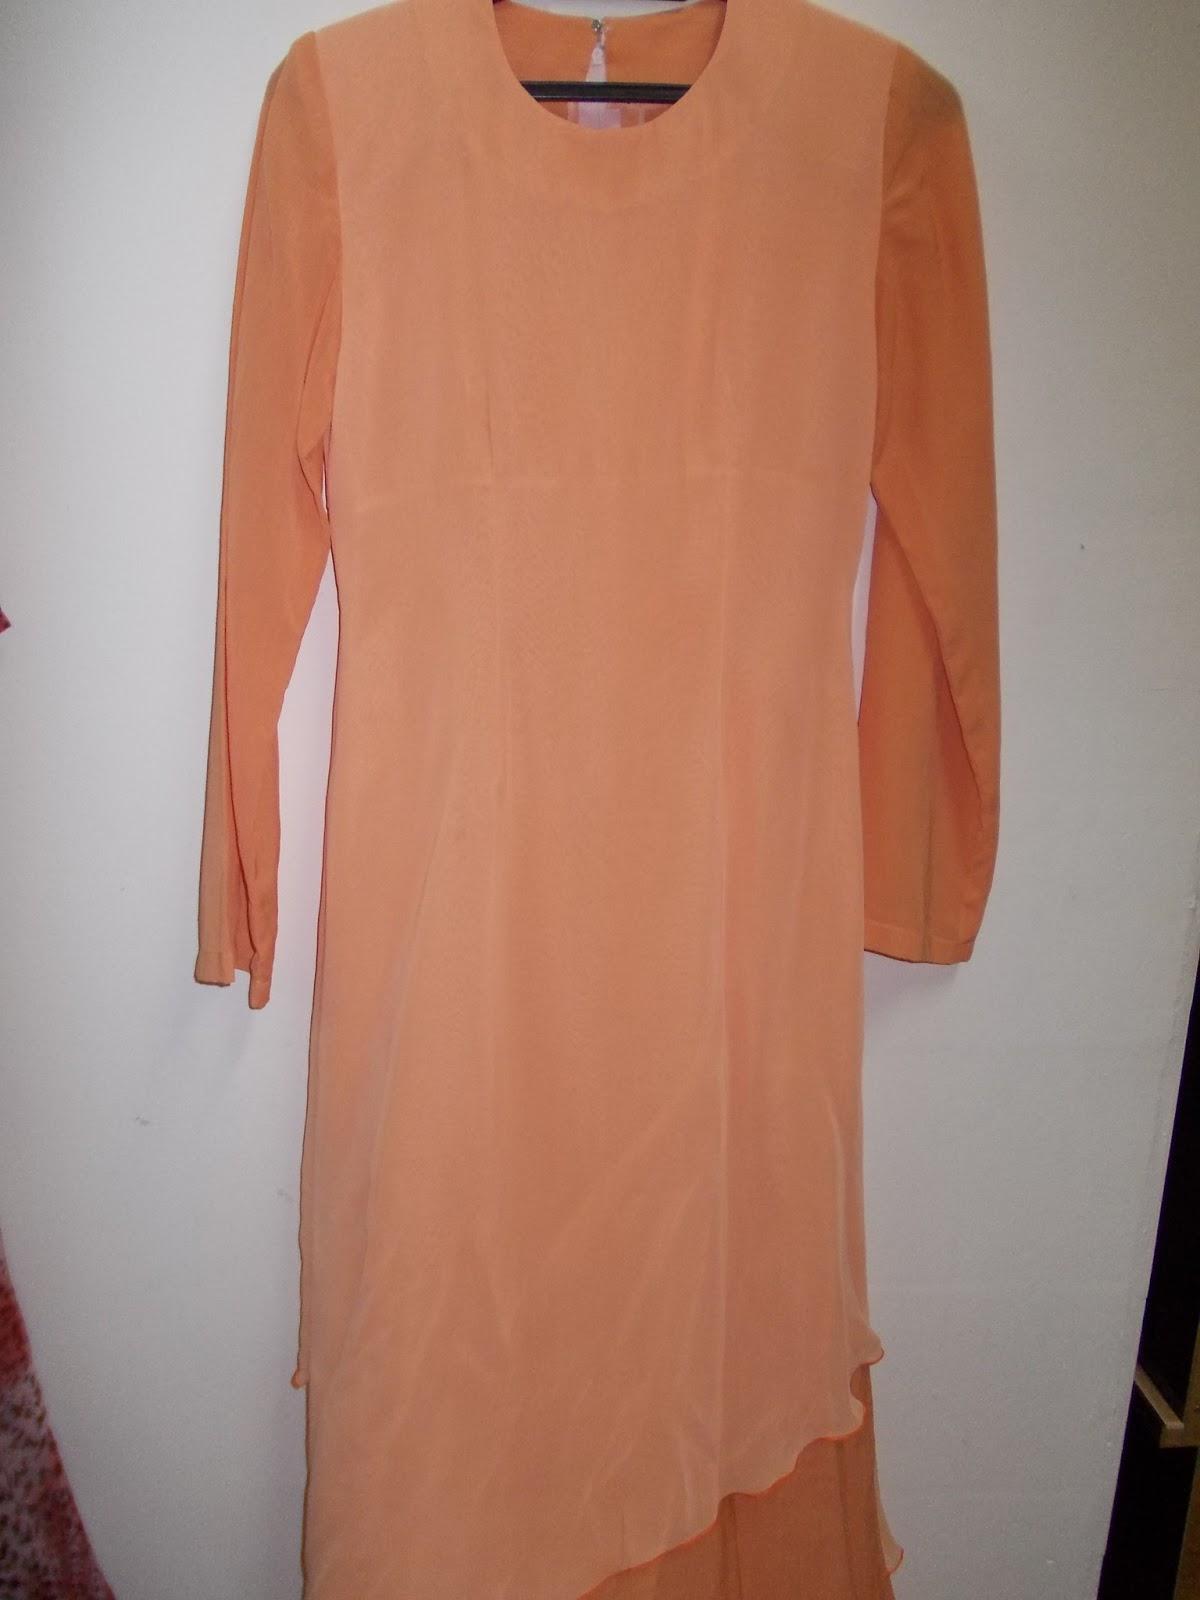 DRESS LABUH BIASA RM 40.00